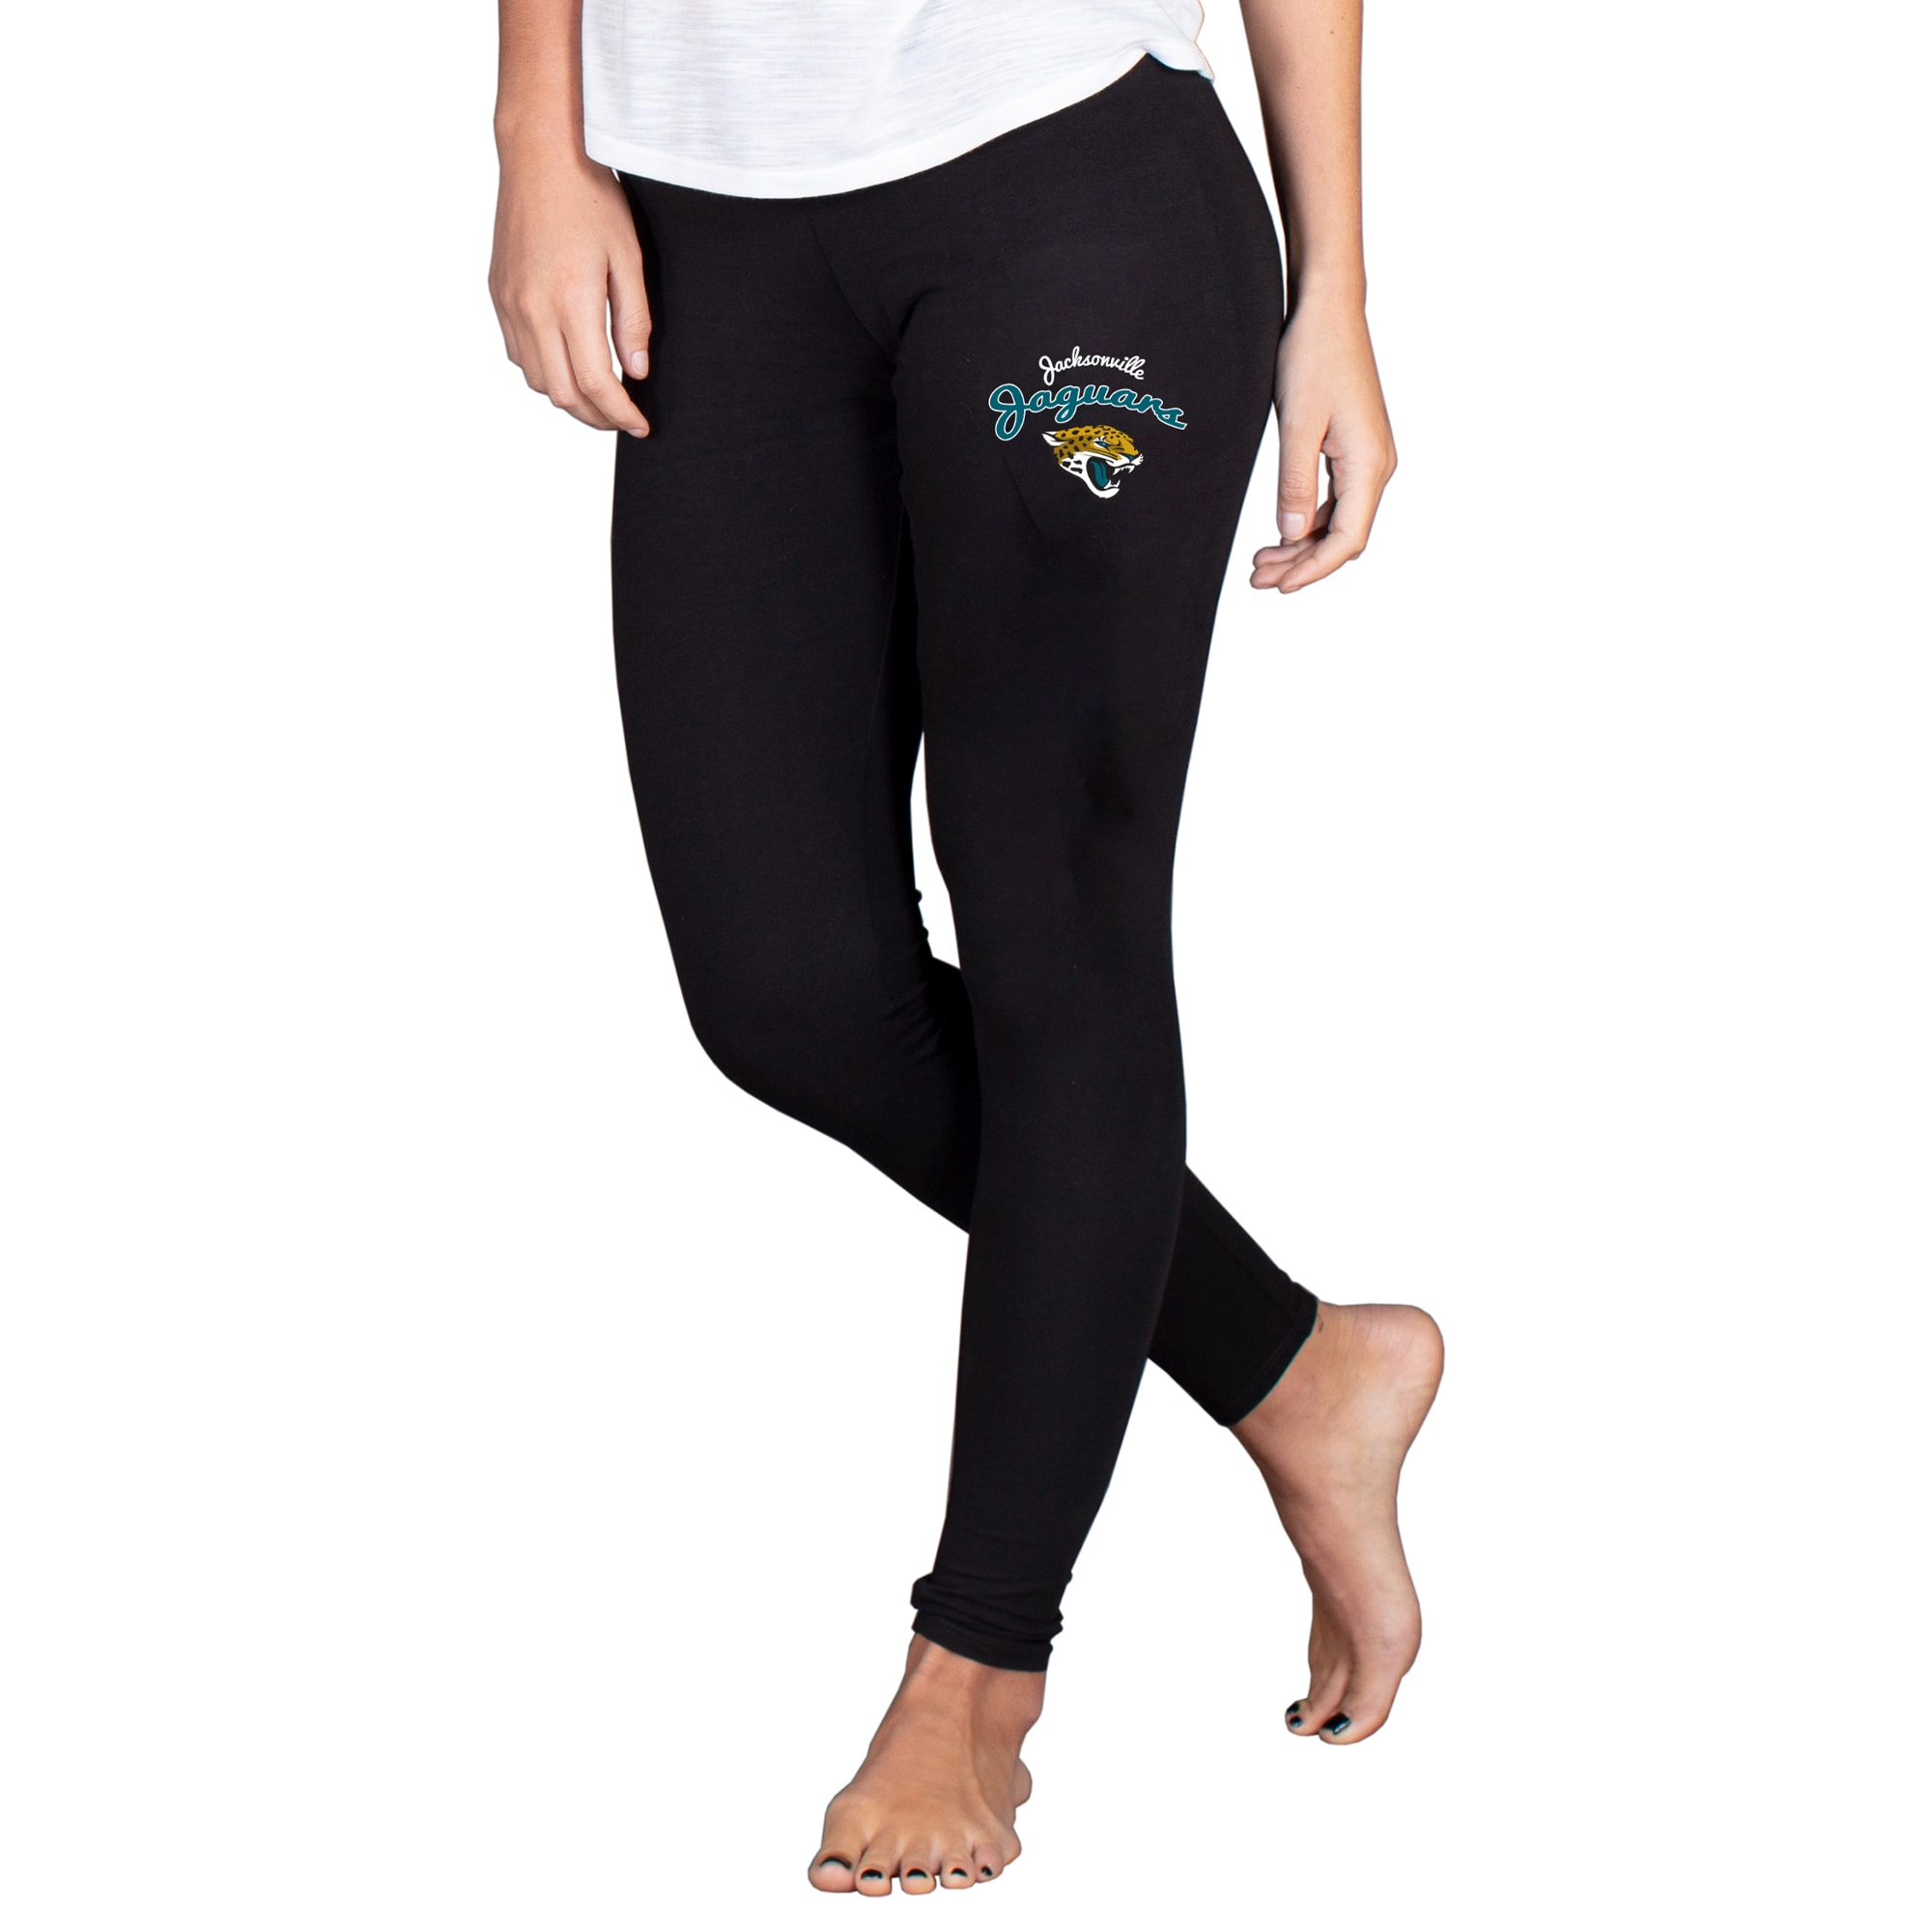 Jacksonville Jaguars Concepts Sport Women's Fraction Leggings - Black